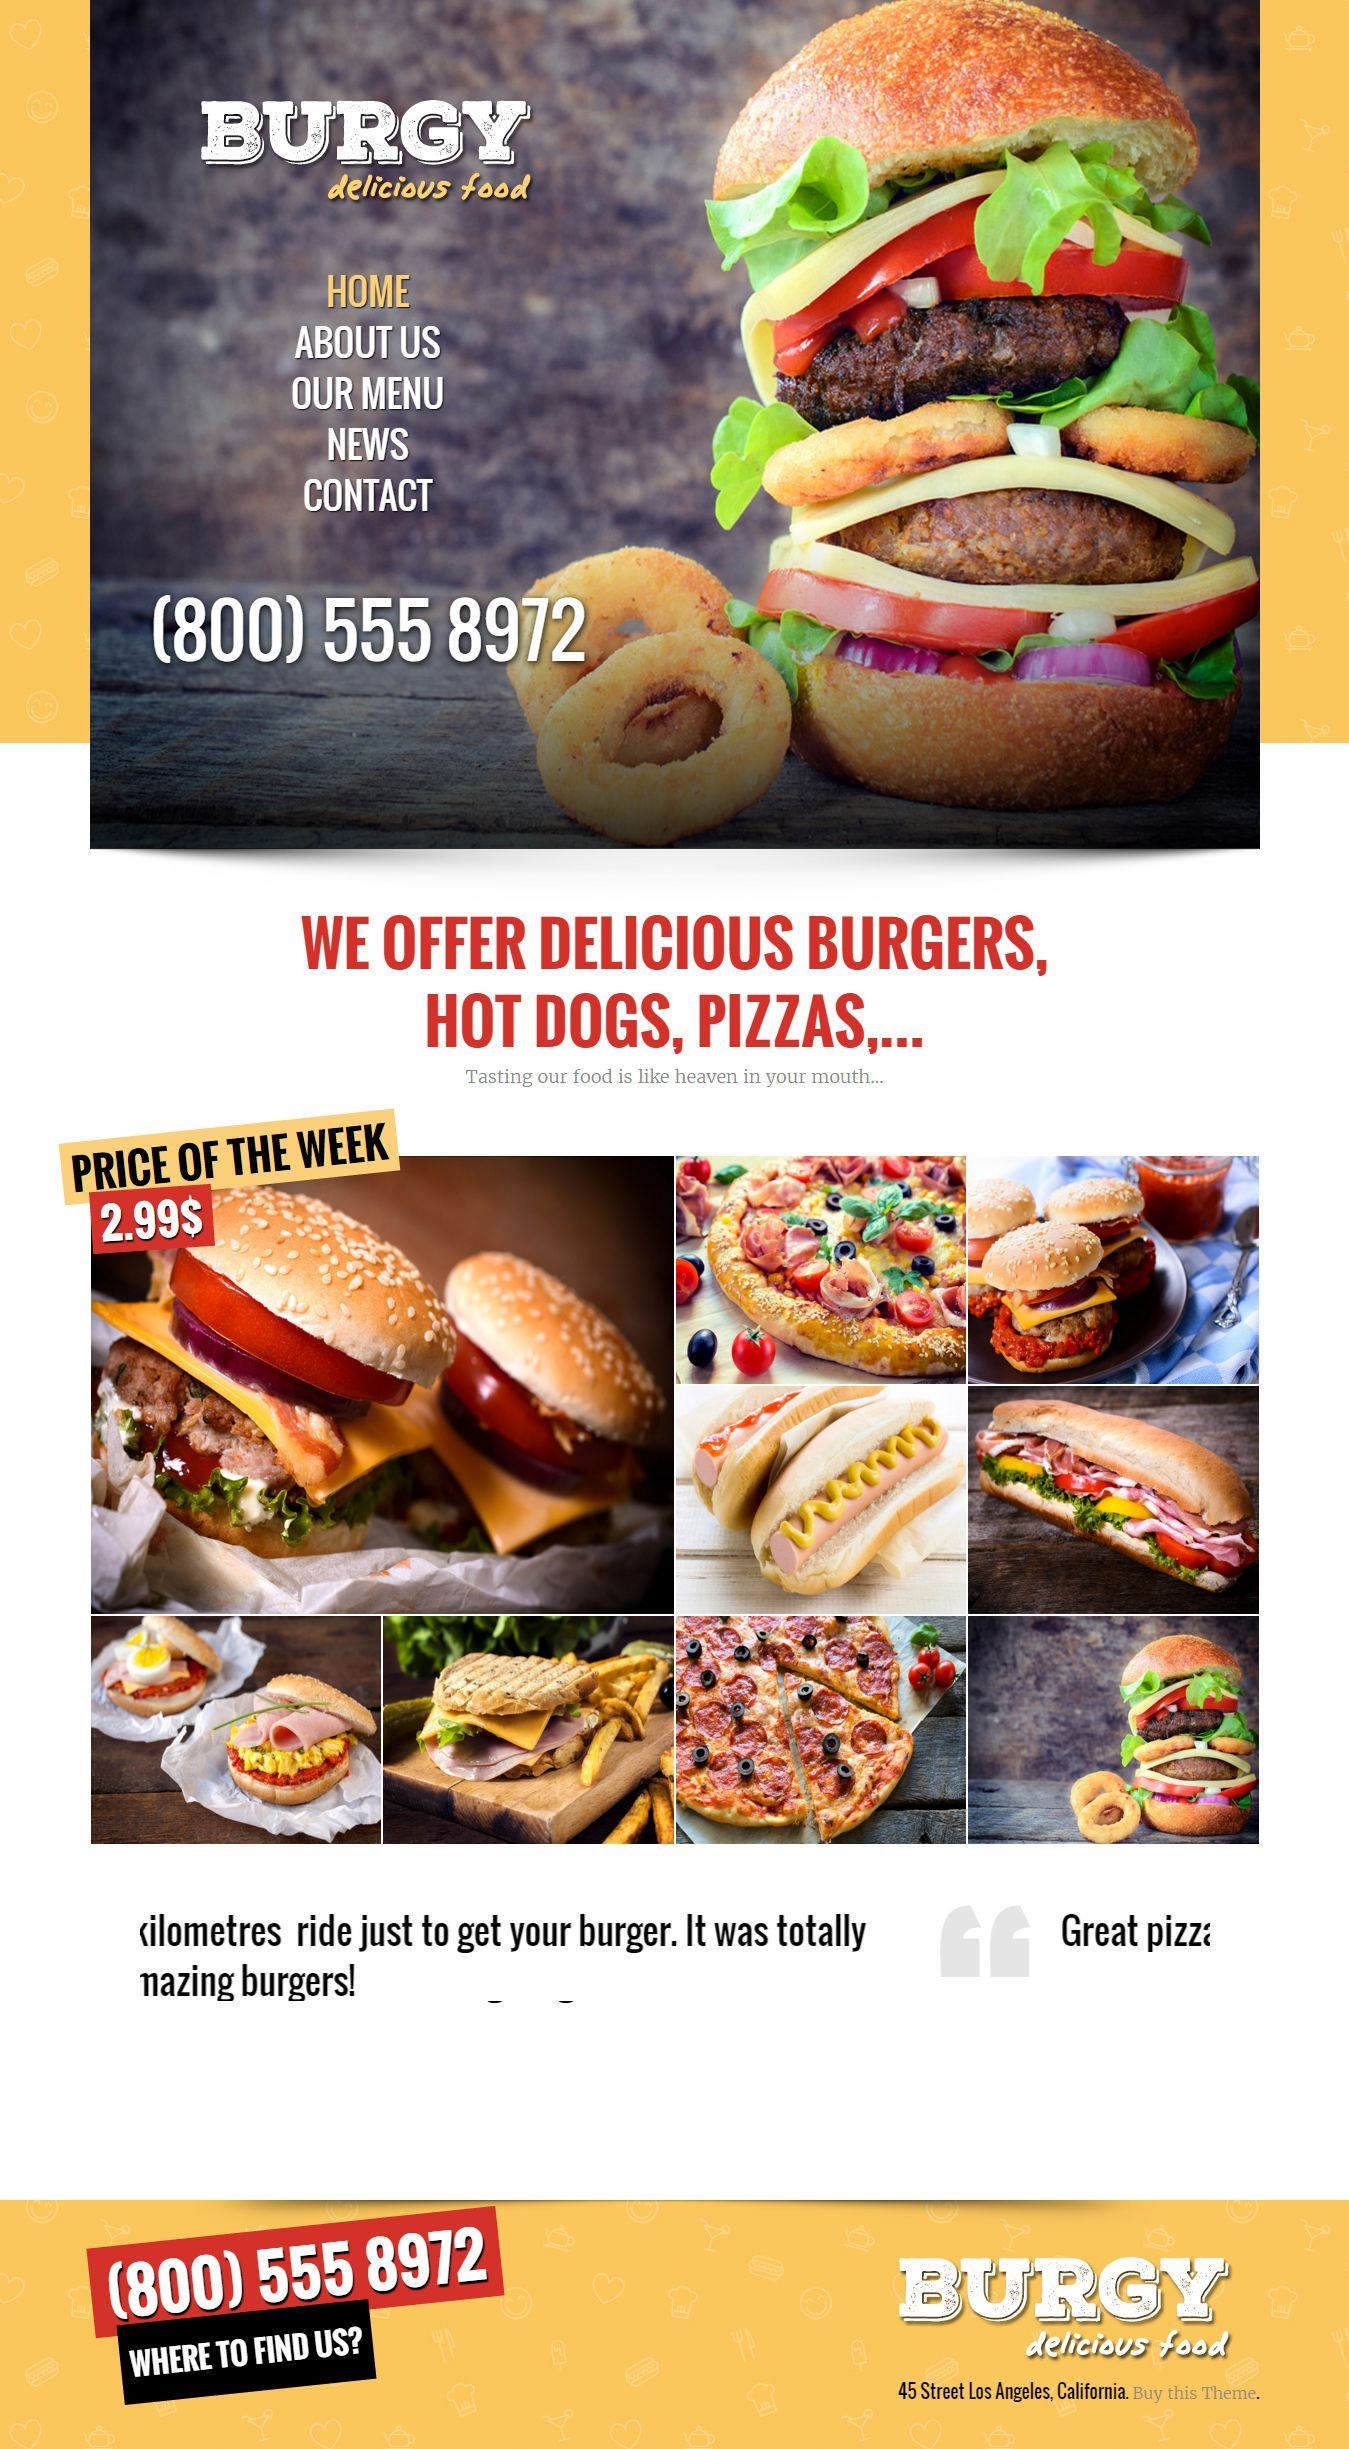 Burgy fast food burgers pizzas salads html template burgy fast food burgers pizzas salads html html website templatesrestaurant pronofoot35fo Images